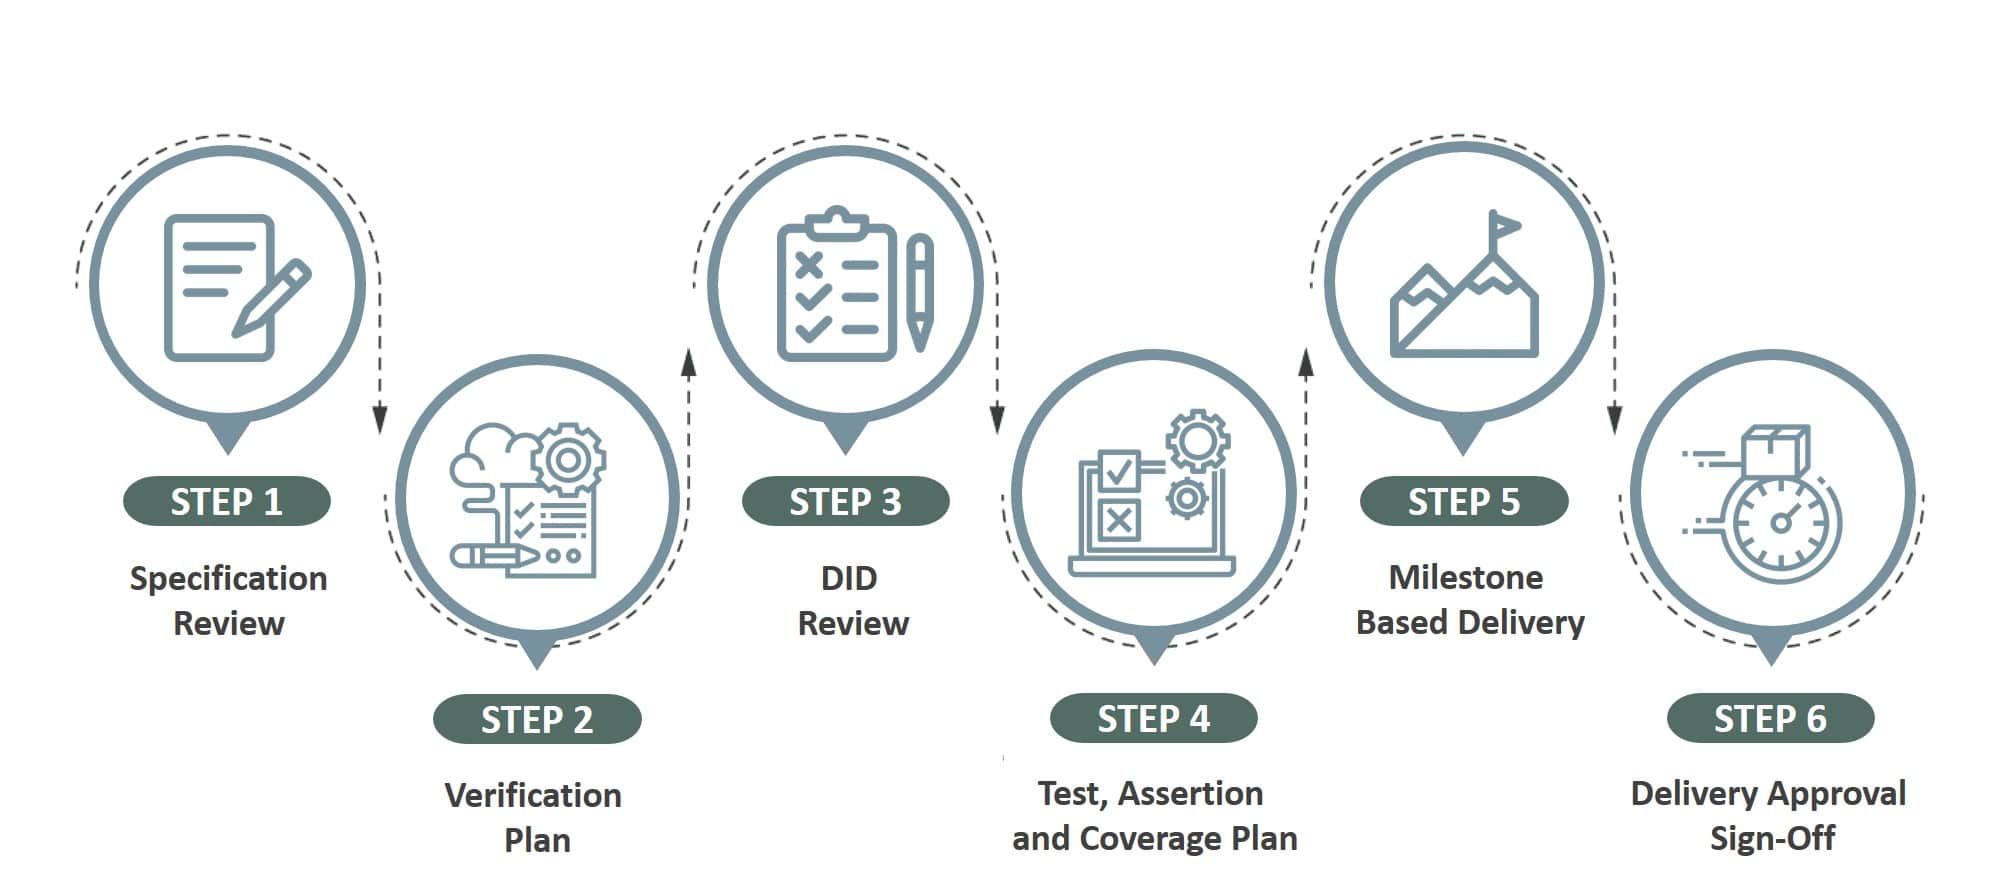 verification-design-process-softnautics